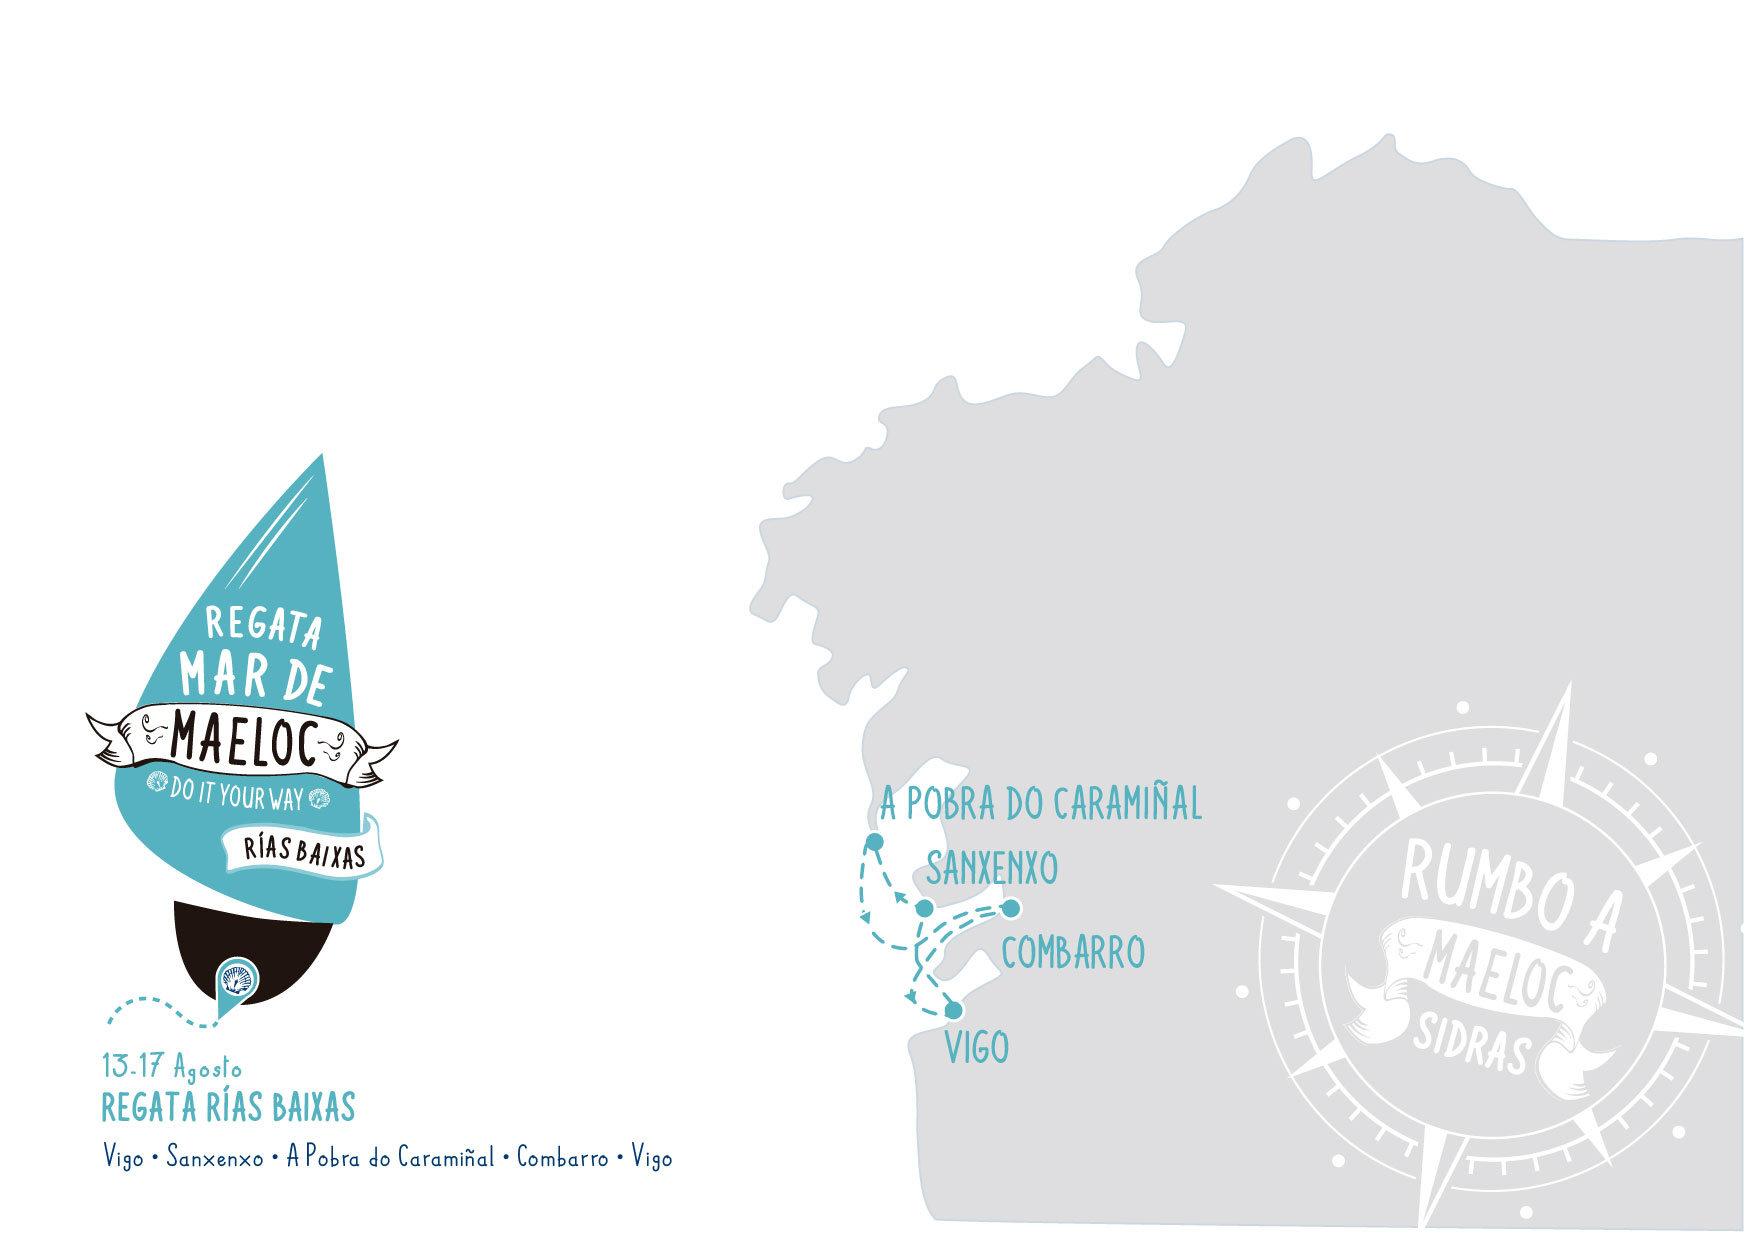 Mar de Maeloc 56ª Regata Rías Baixas 2019